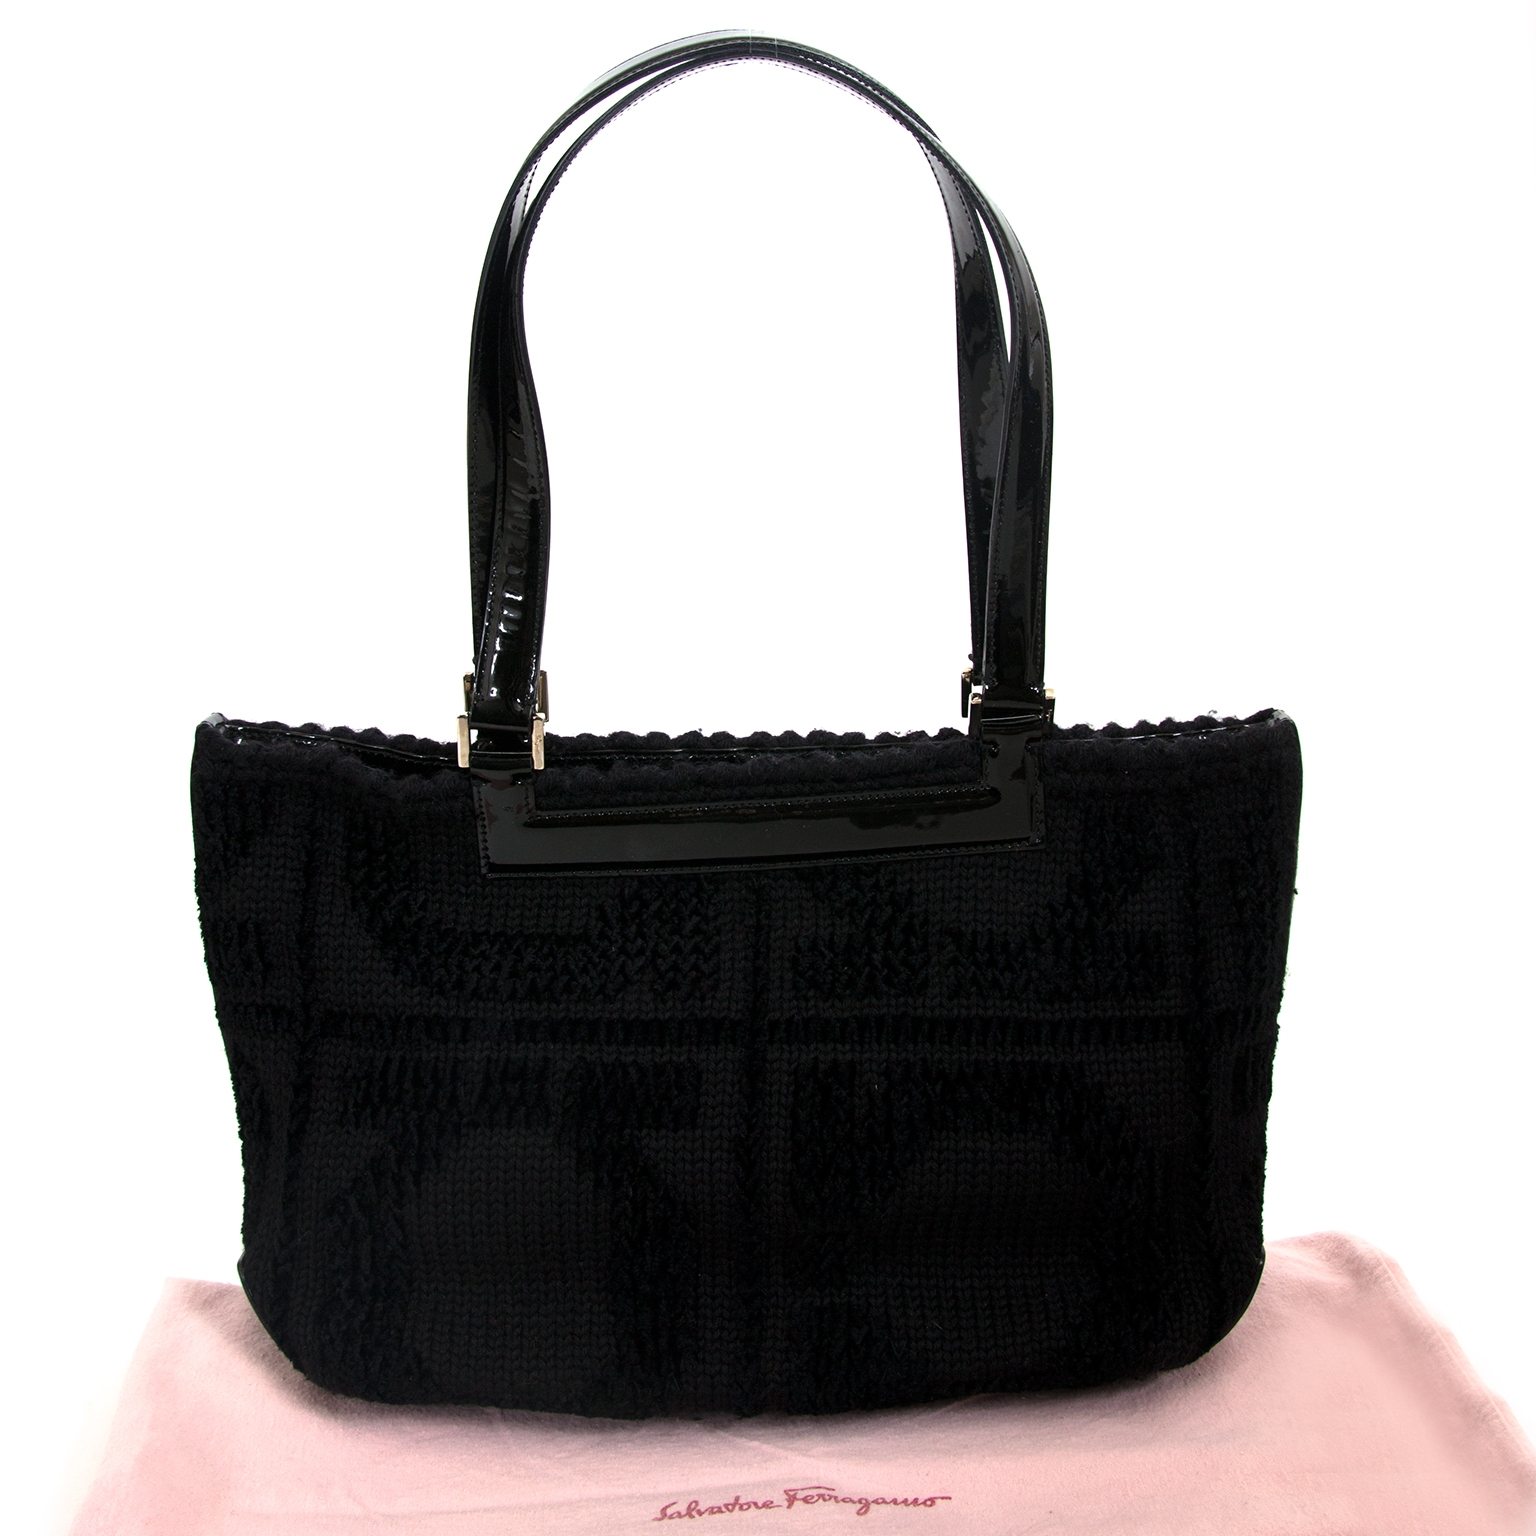 Salvatore Ferragamo Black Shoulder Bag now for sale at labellov vintage fashion webshop belgium